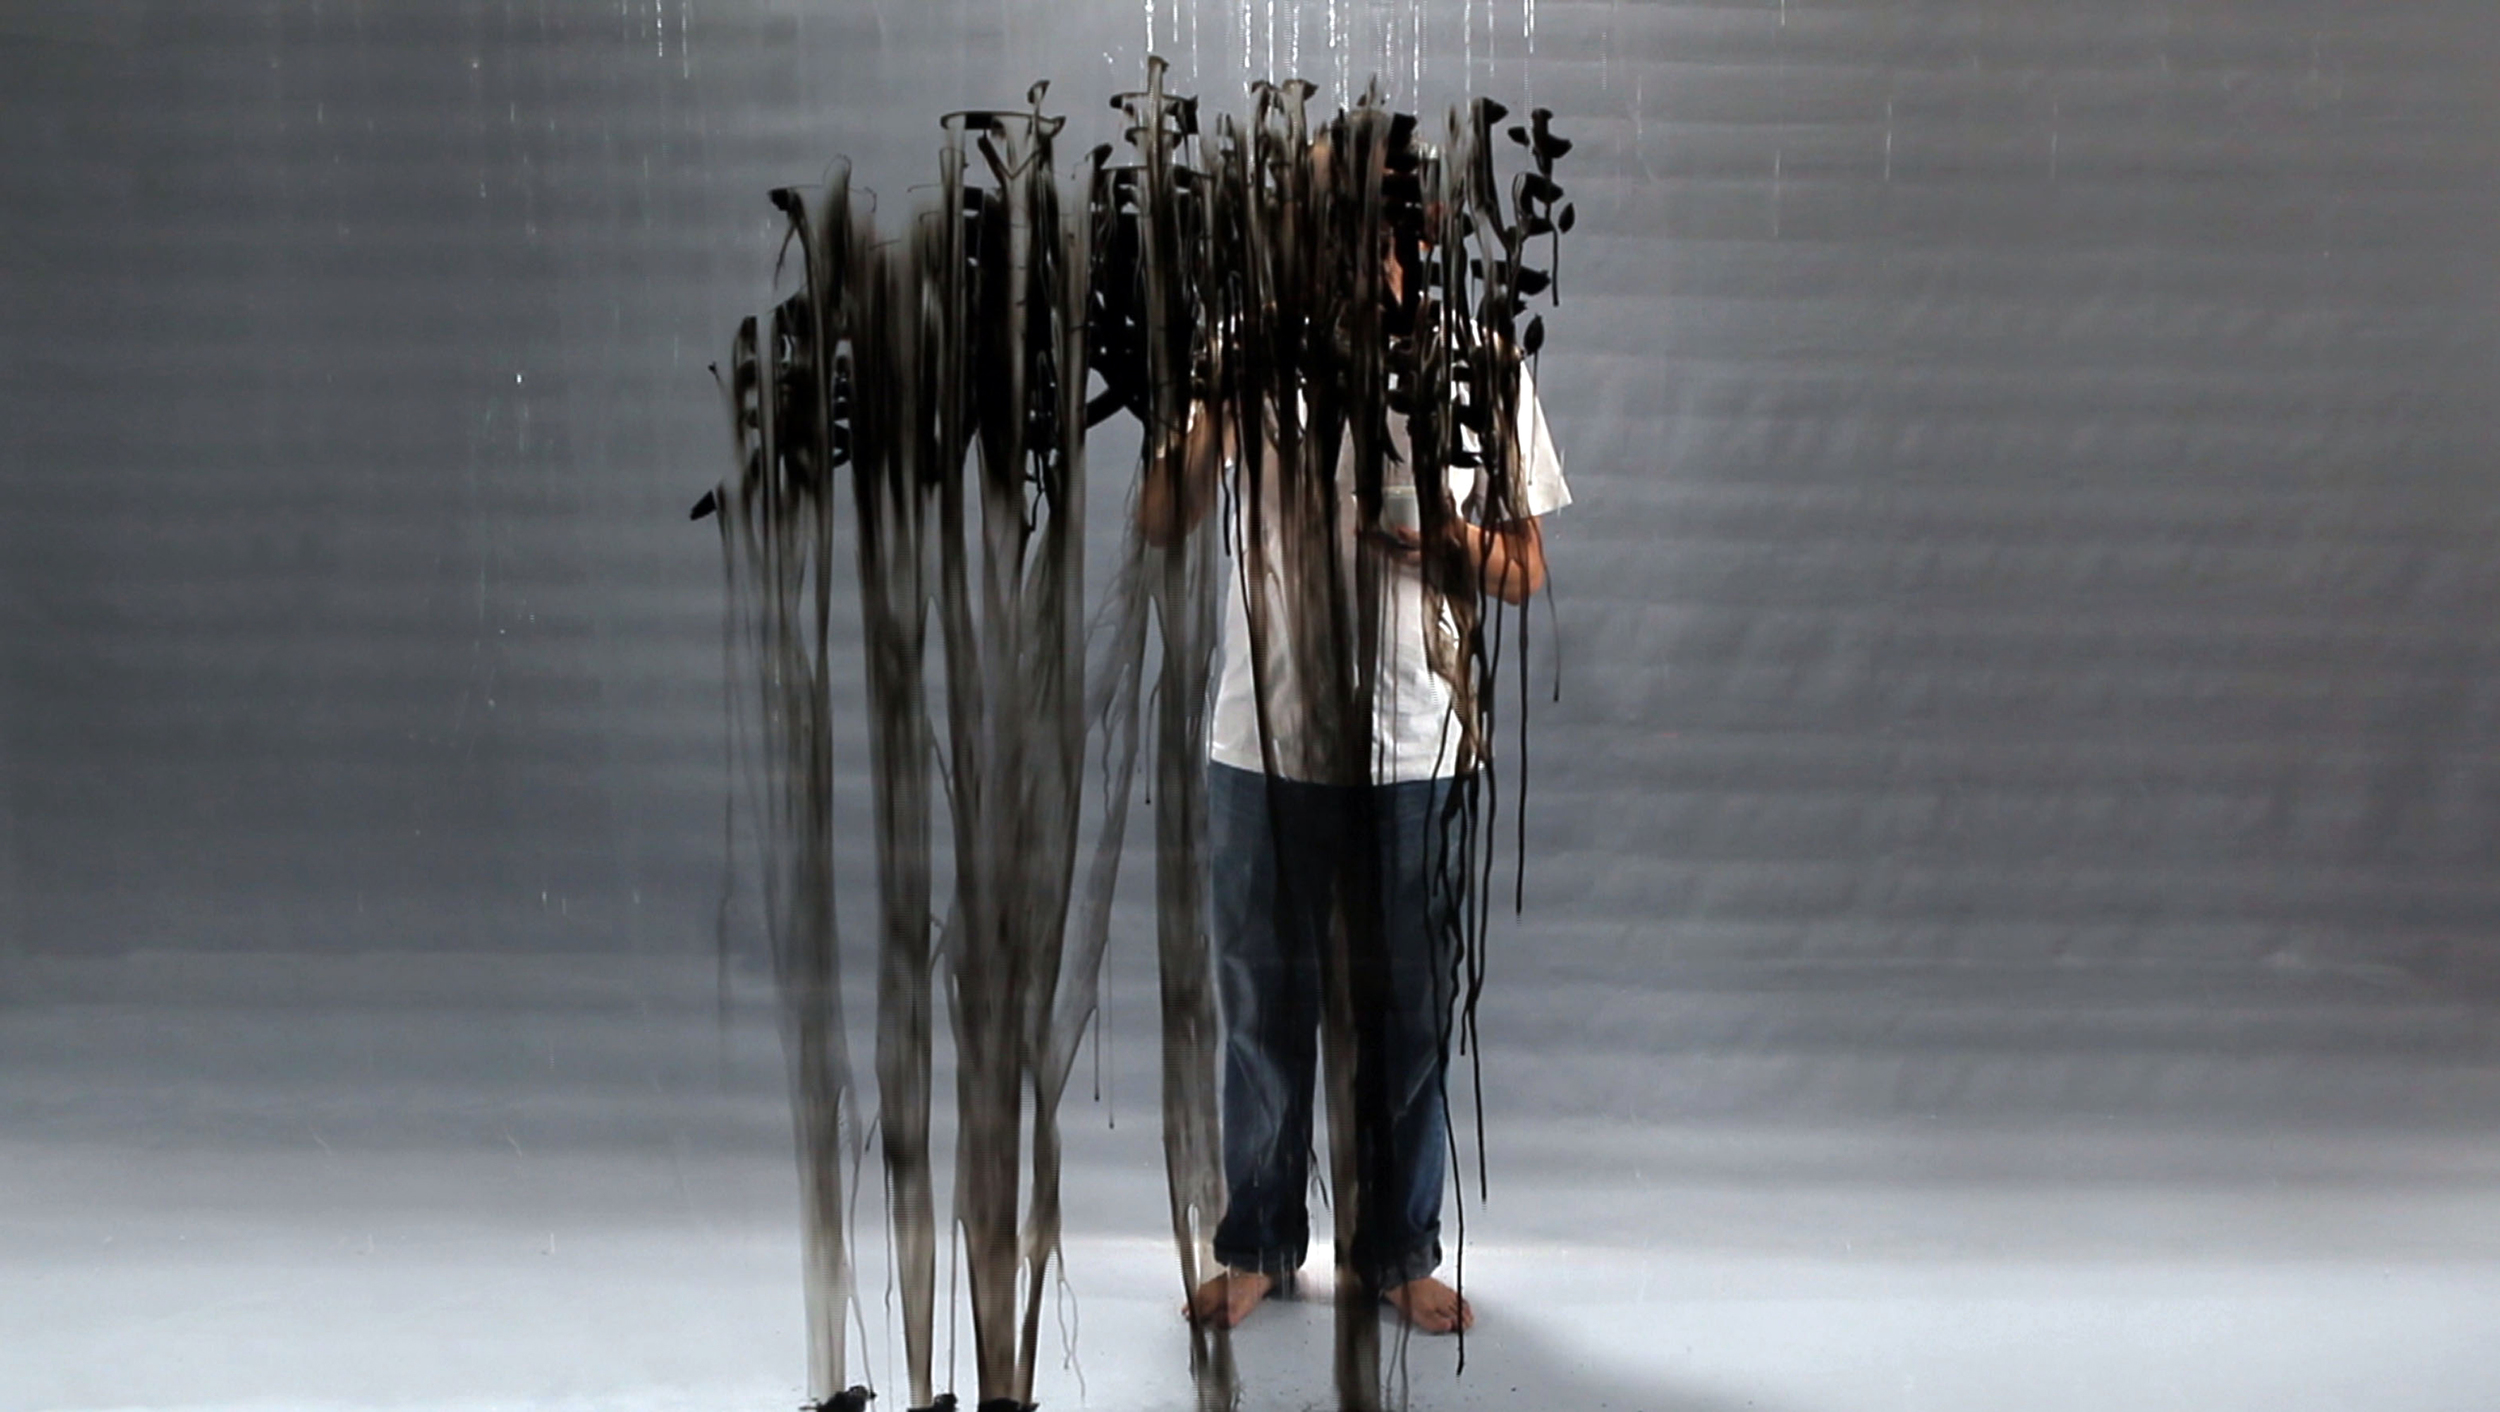 FX Harsono,  Writing in the Rain  (still), 2011, single channel video, 6:02 minutes, edition of 5. Courtesy of the artist.